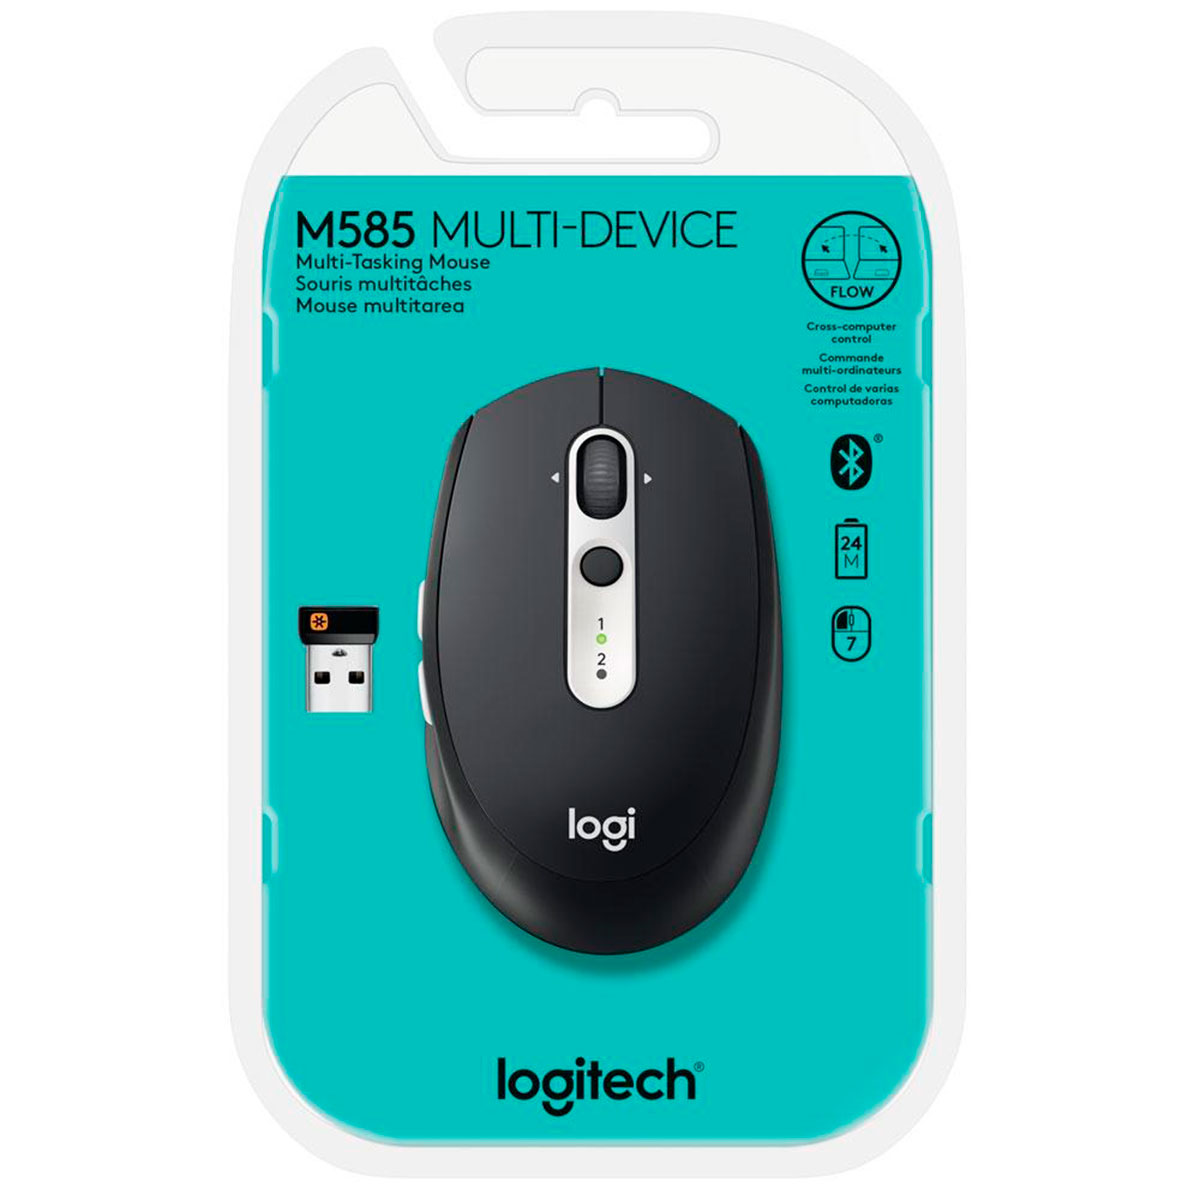 Mouse Bluethooth Logitech M585 Multi-Device, Tecnologia Flow Unifying, 1000DPI, Preto